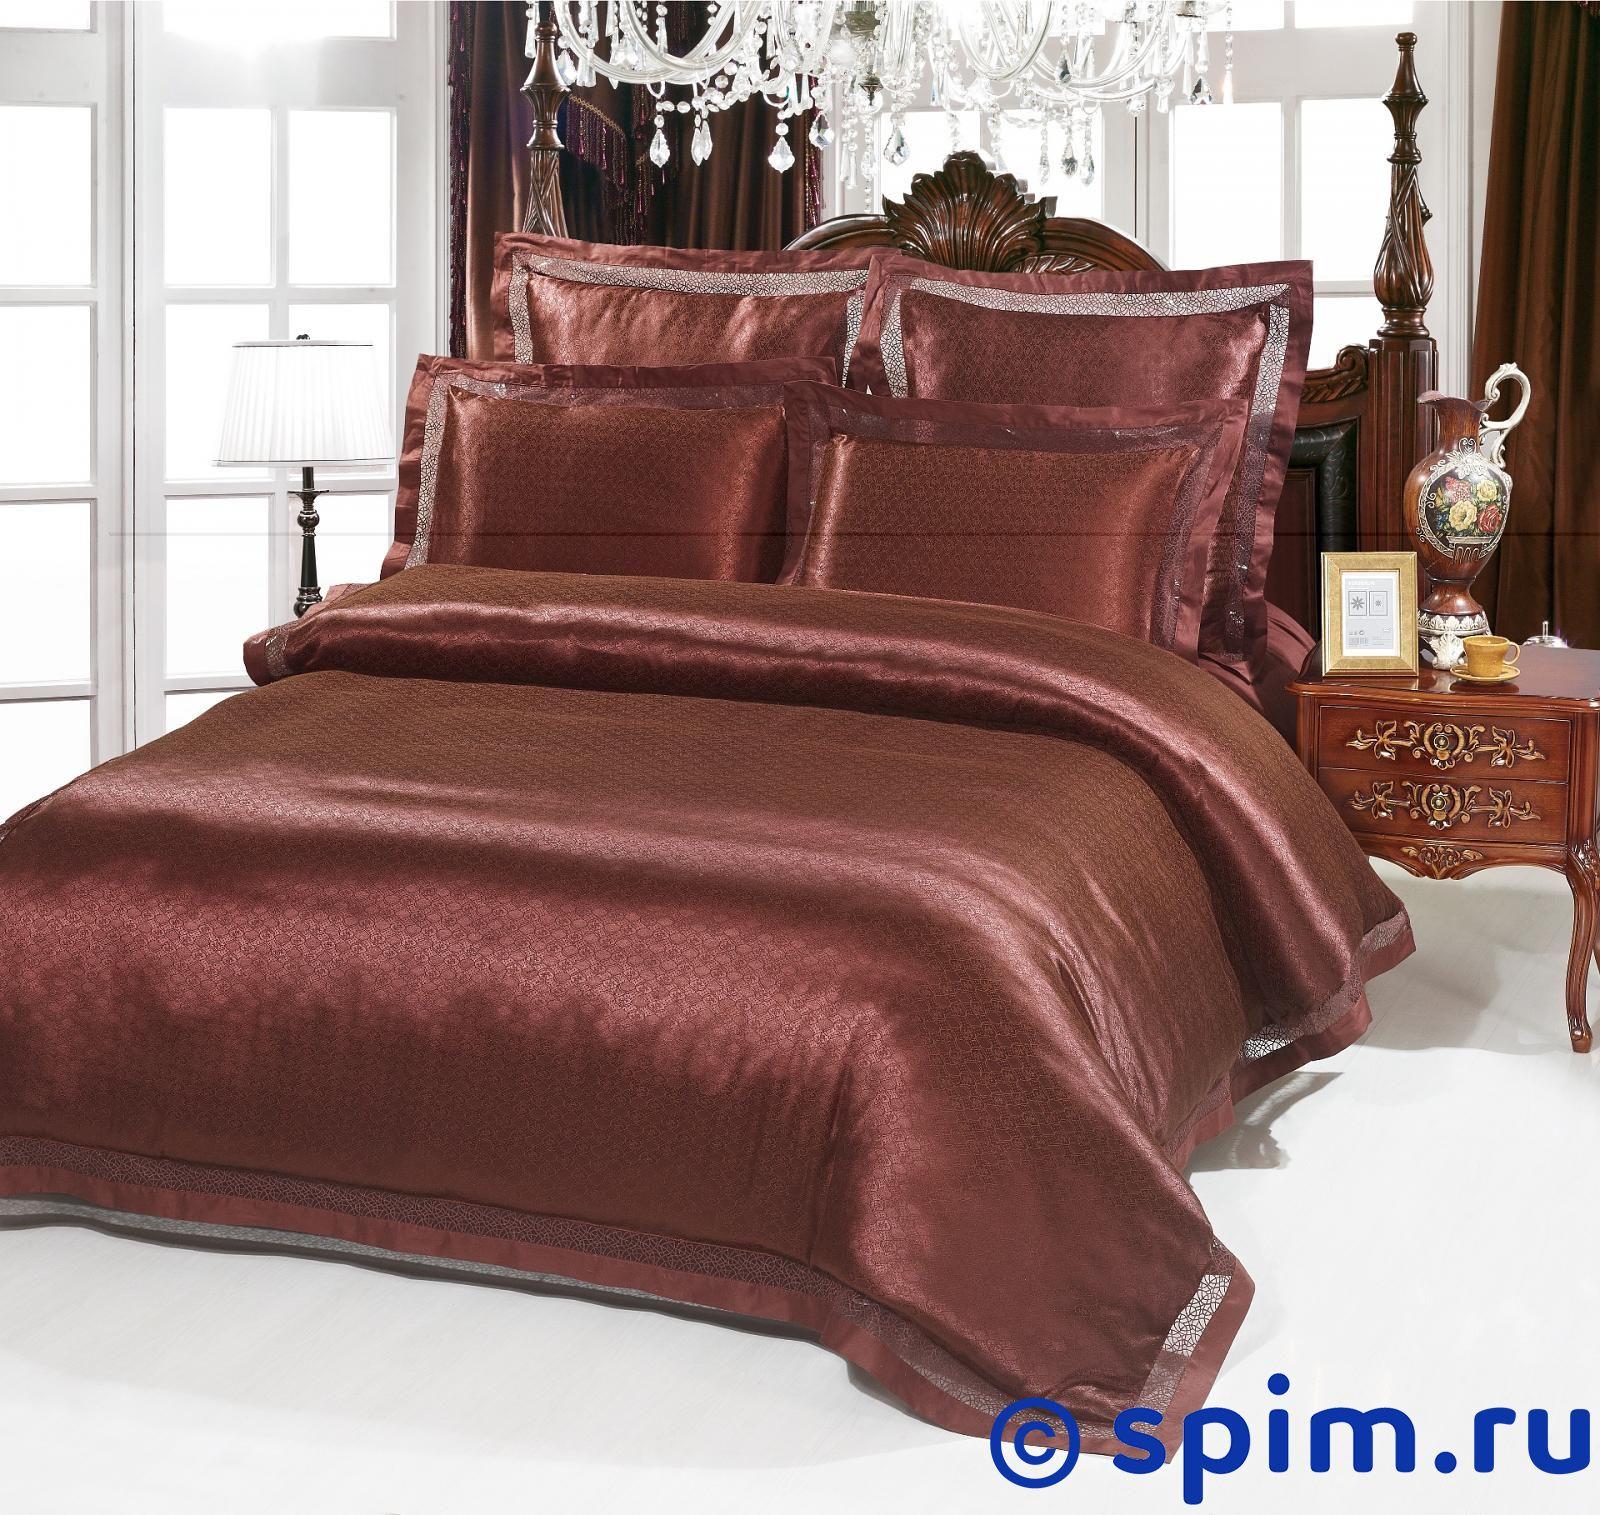 Постельное белье Kingsilk SB-115 Евро-стандарт цена